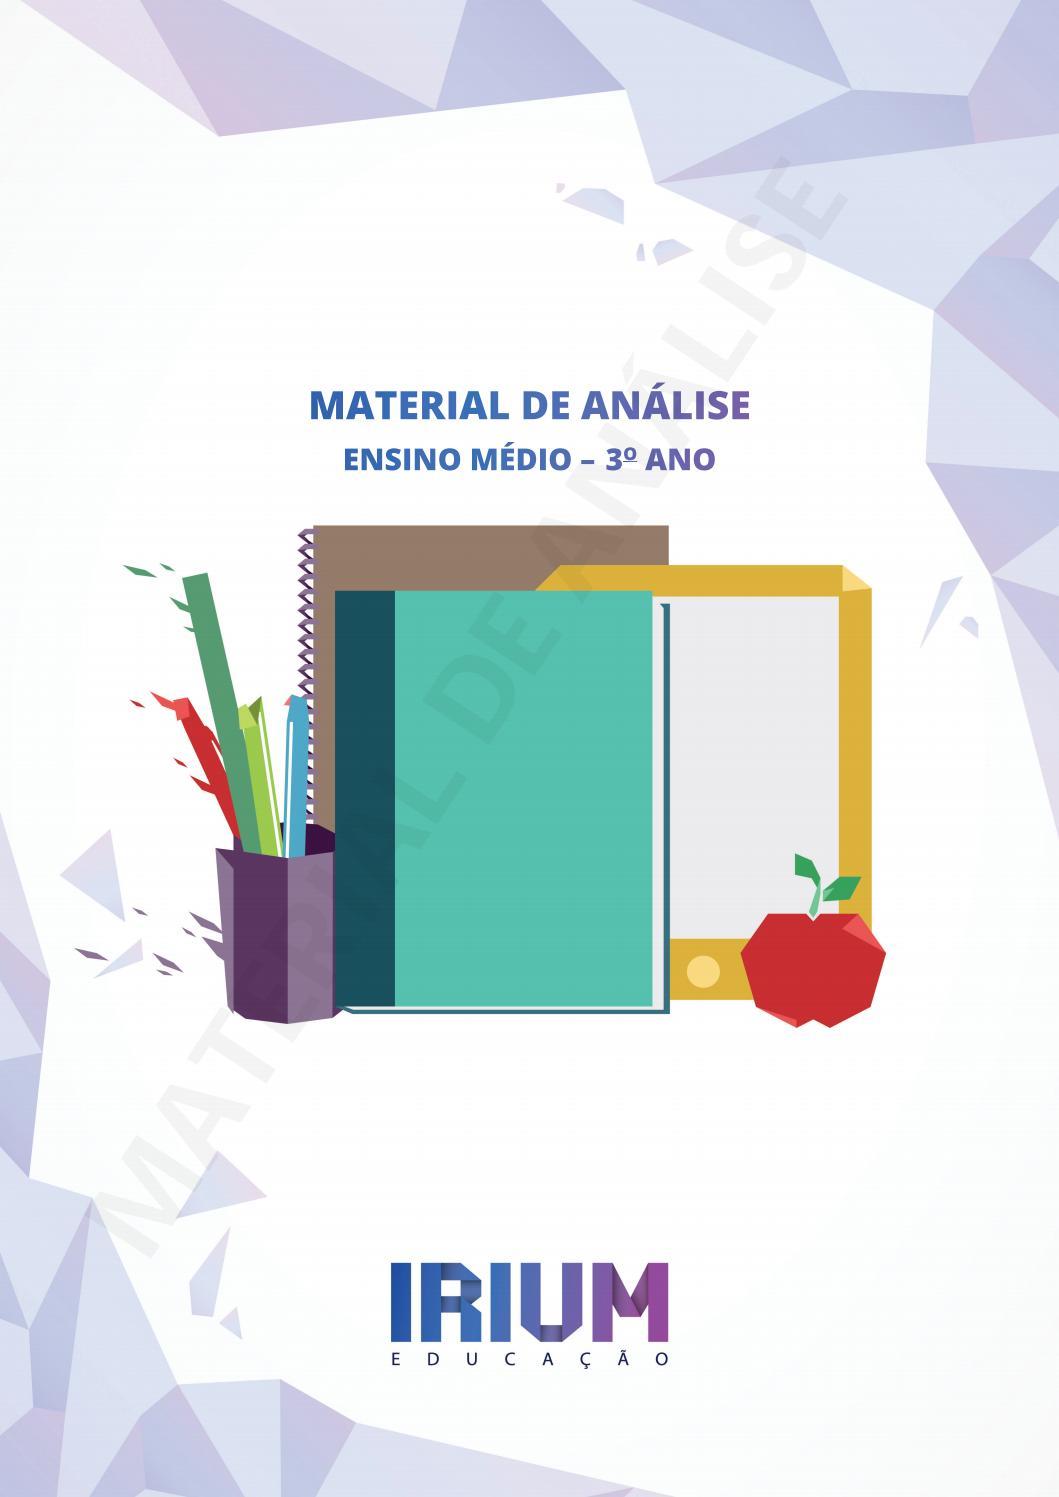 6d4f0486e4c Material de Análise - 3º ano, Ensino Médio by iriumeducacao - issuu